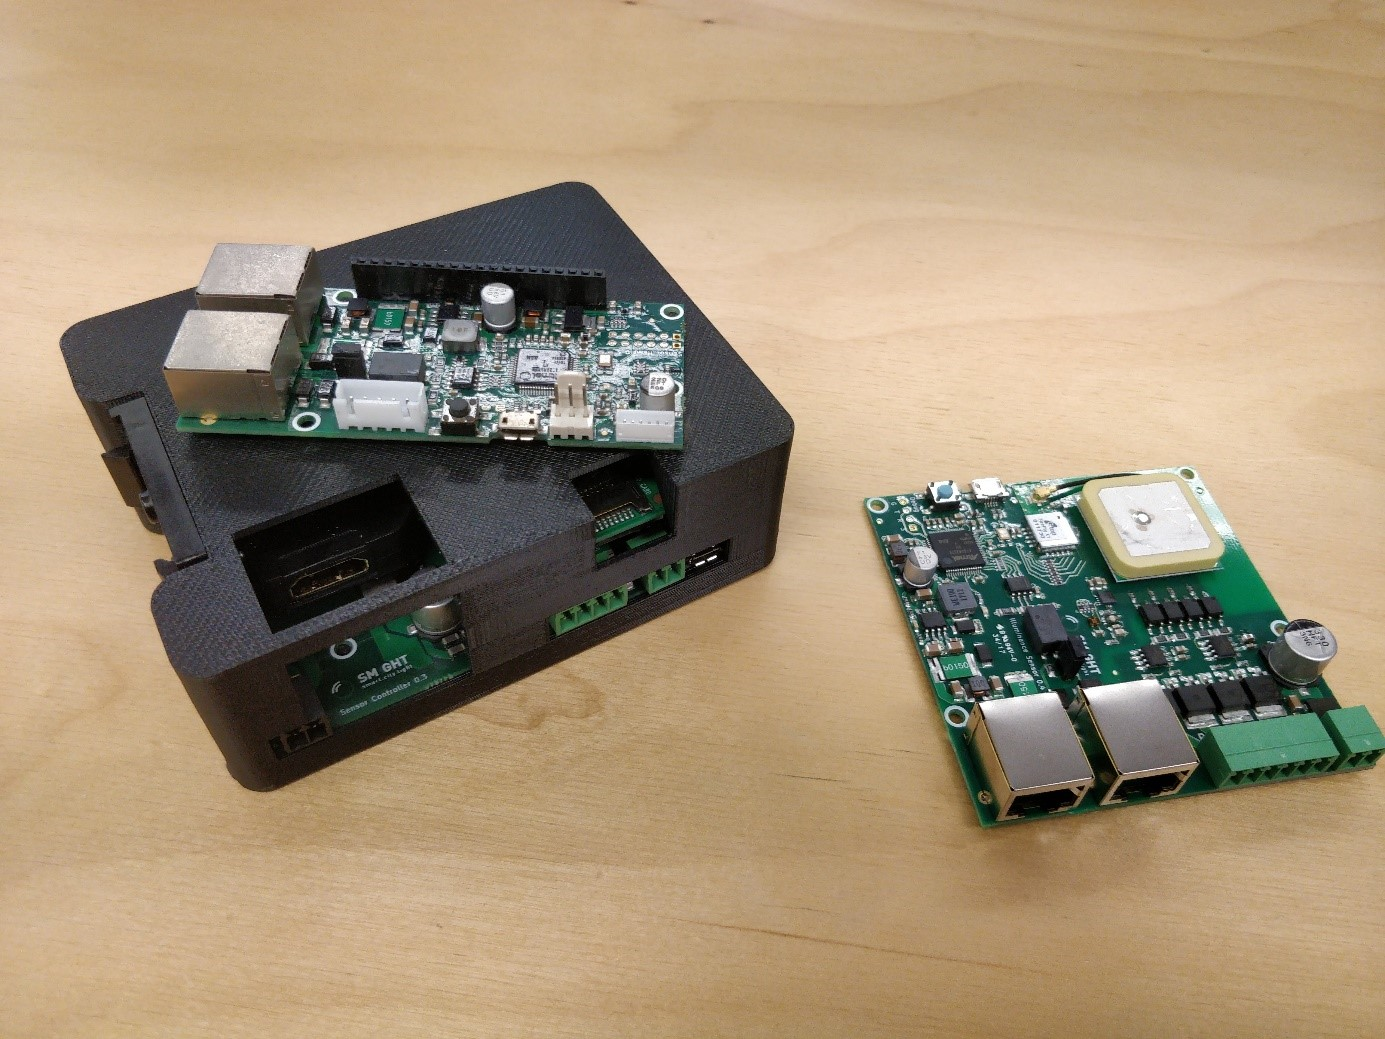 prtg-network-monitor-smght2.jpg